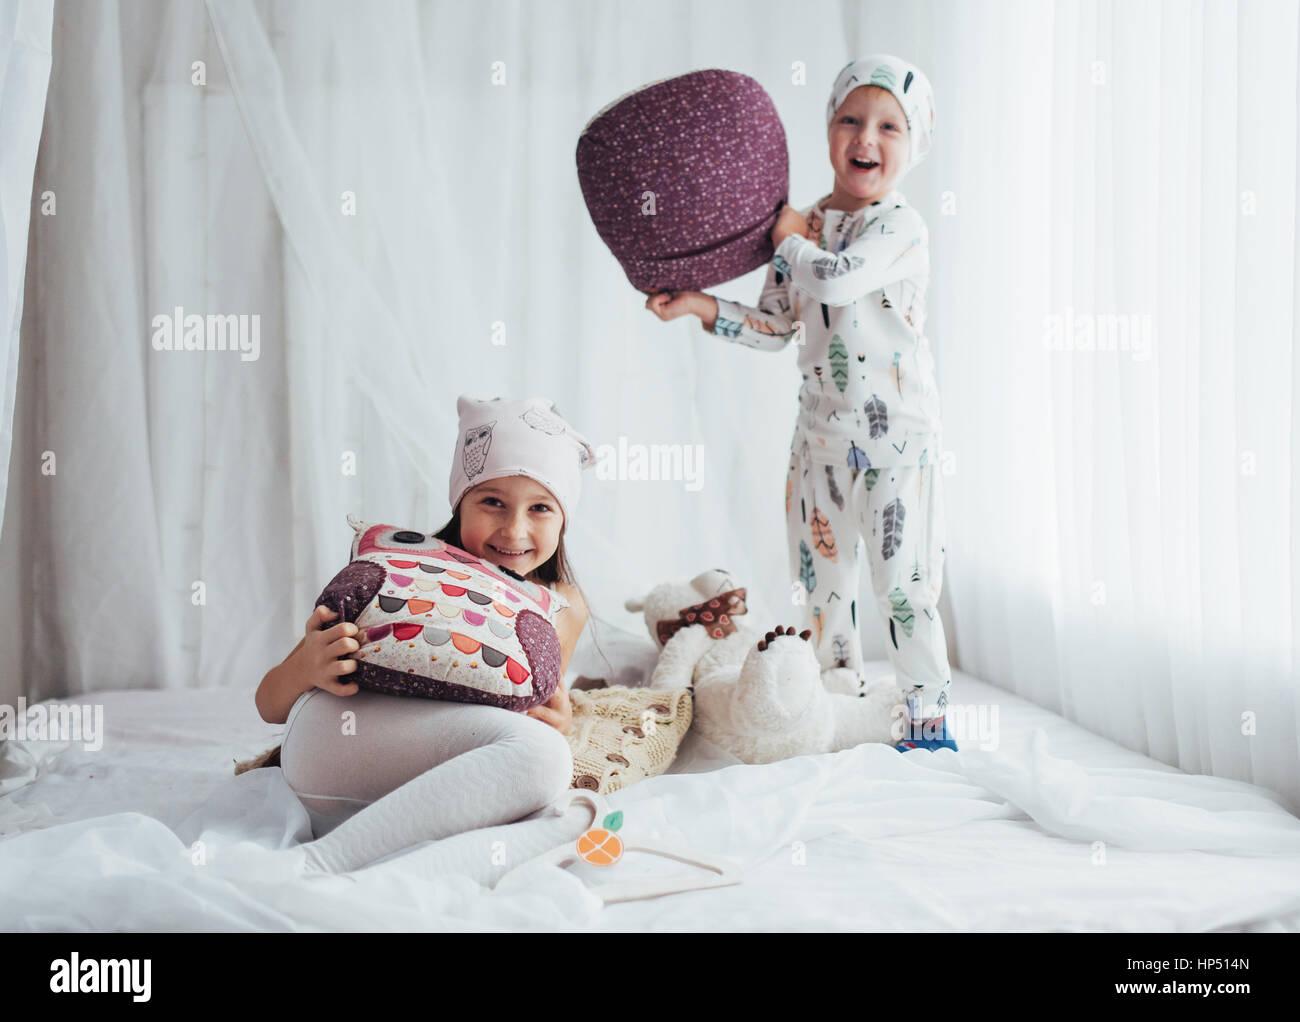 Children in pajamas - Stock Image